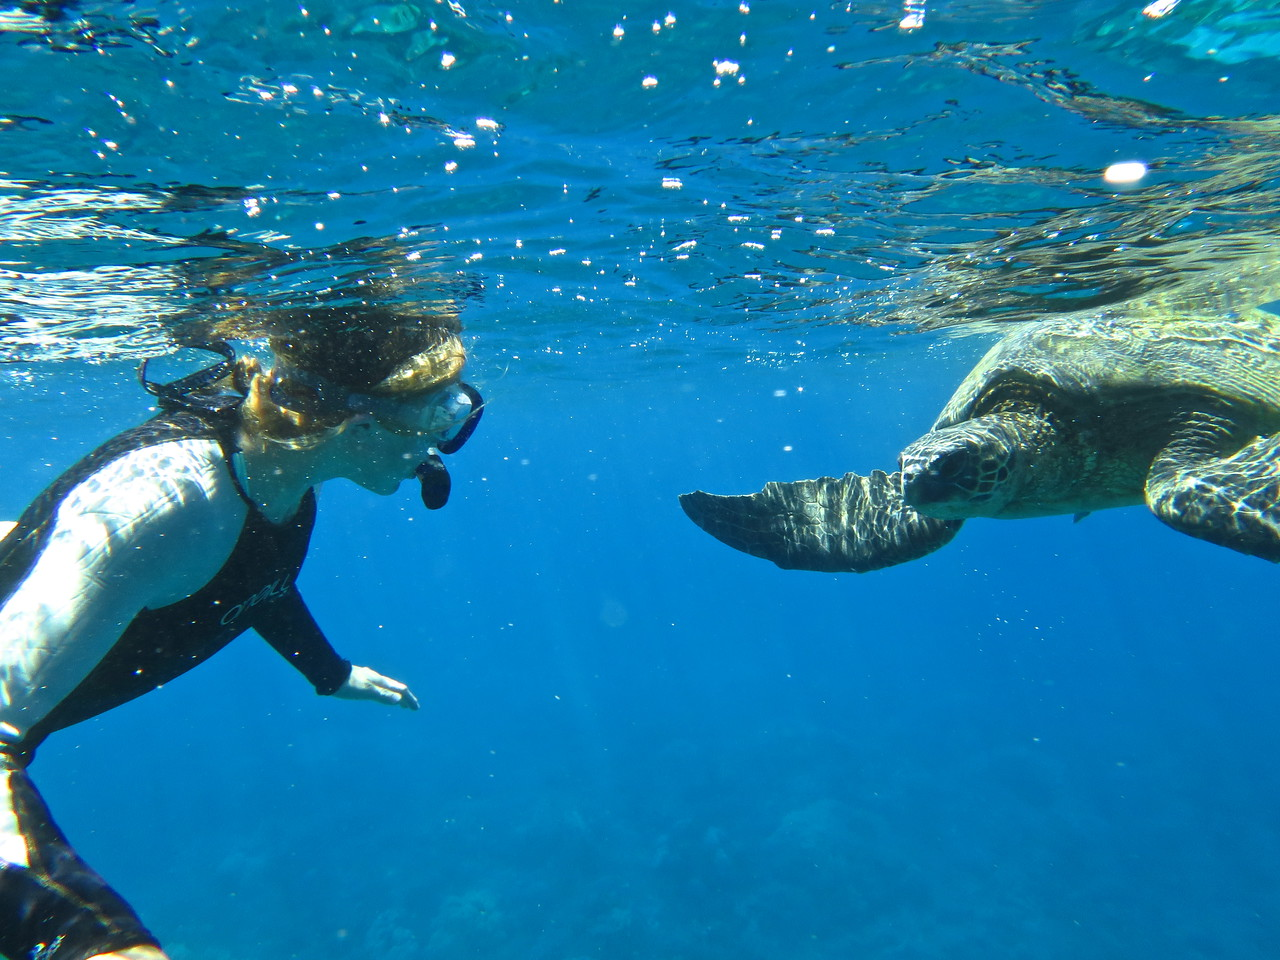 Claire (Bear) Maui Snorkel trip